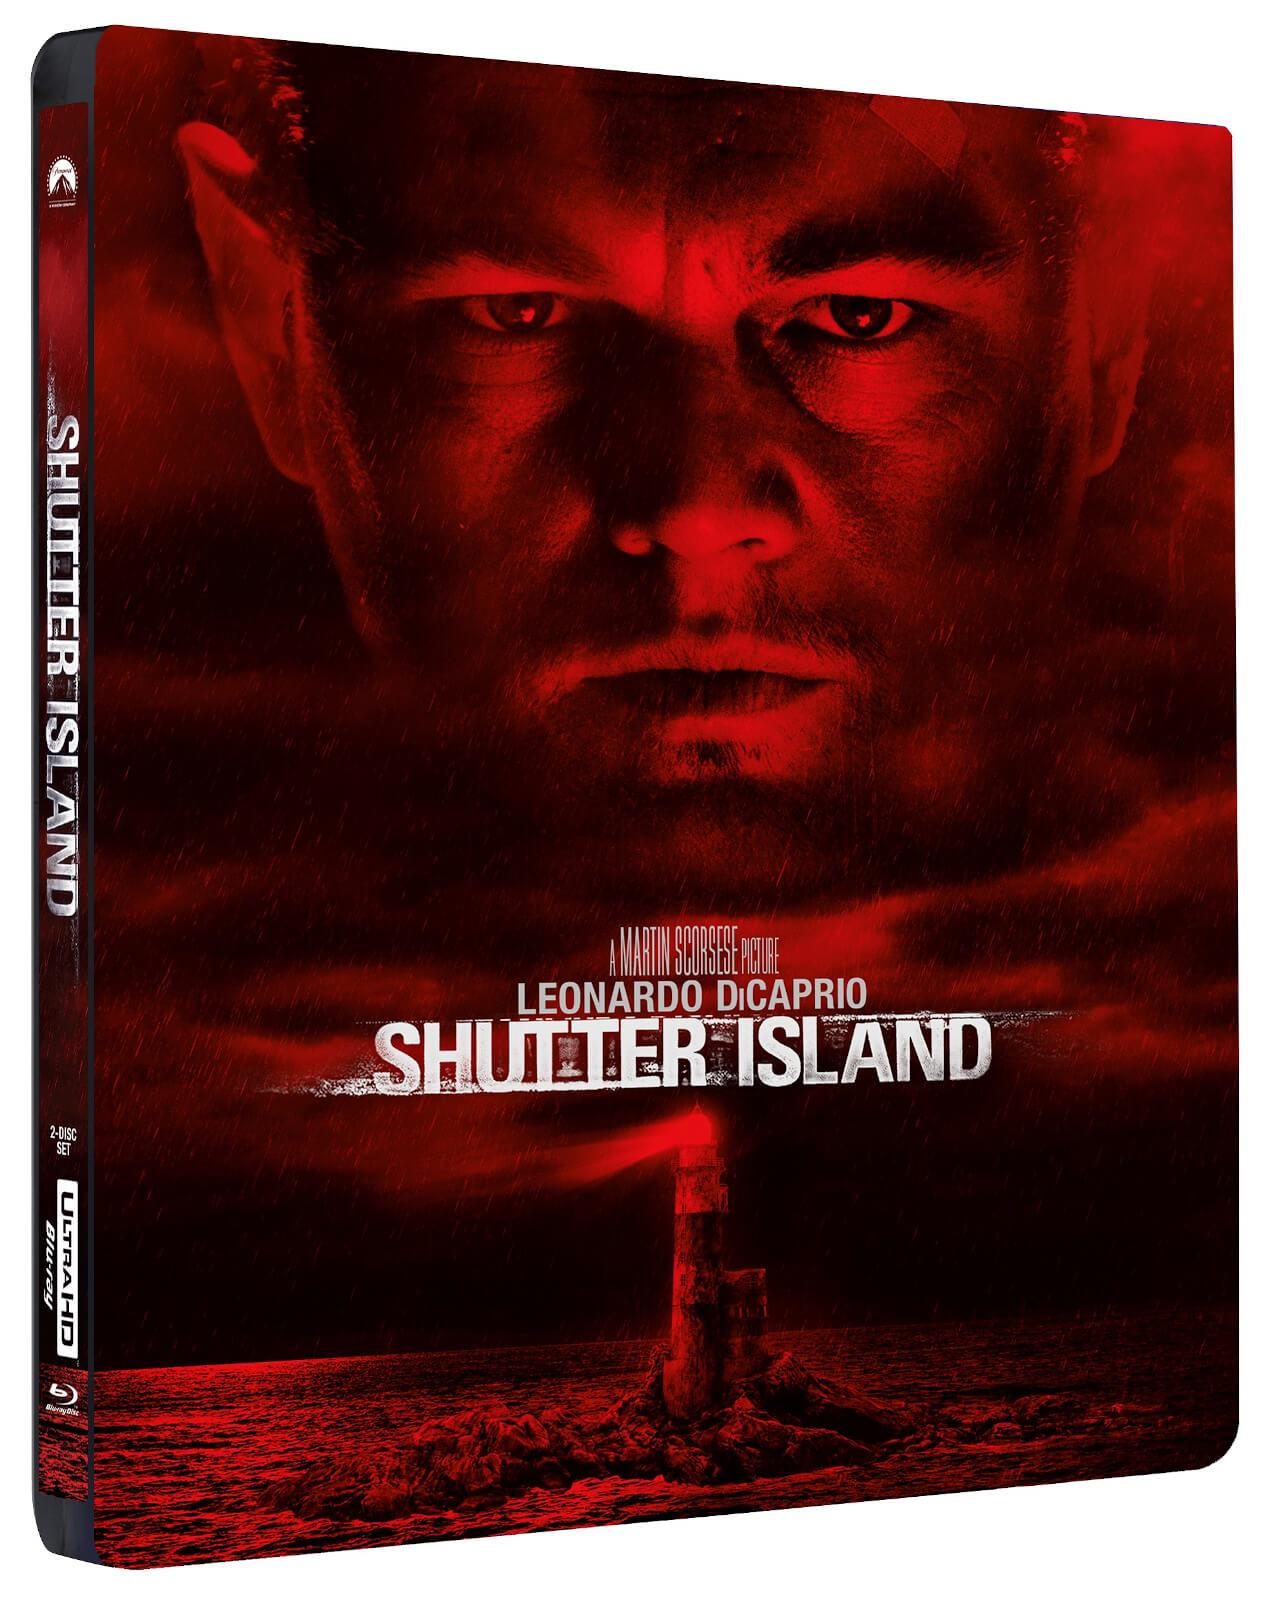 Shutter Island 10th Anniversary Limited Edition 4k